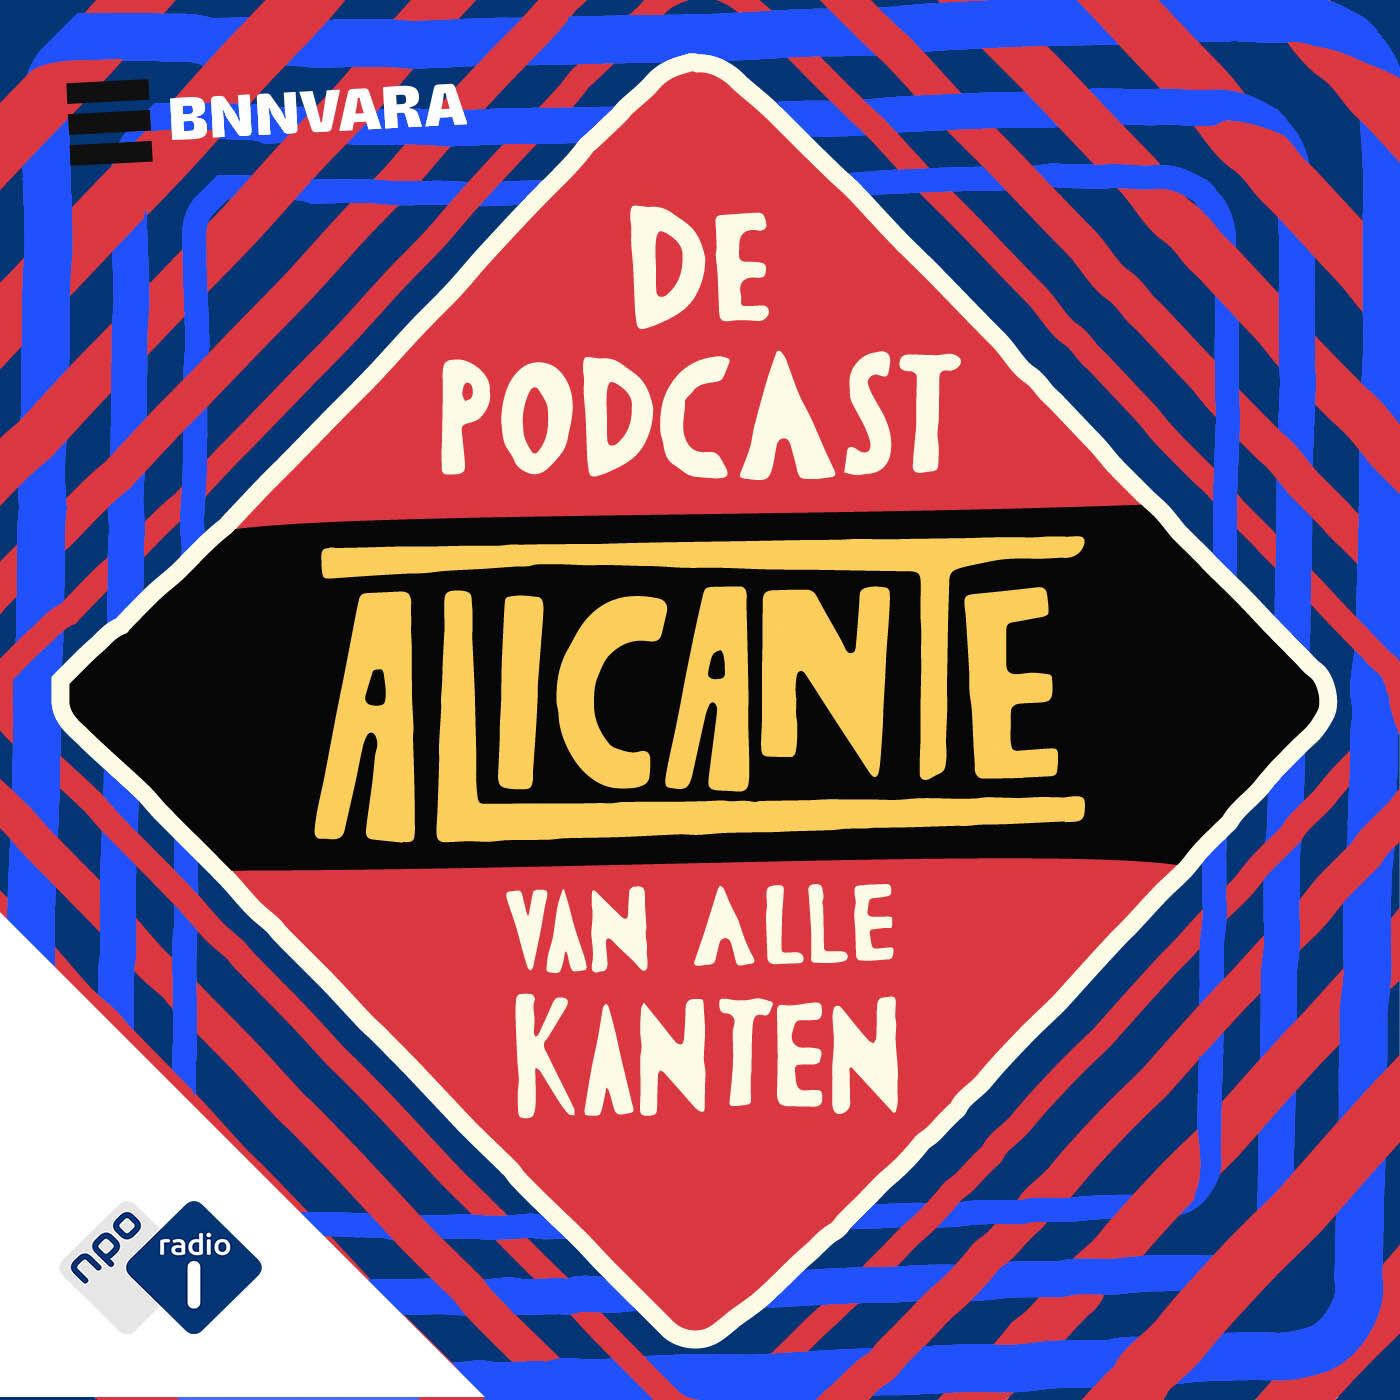 Alicante logo